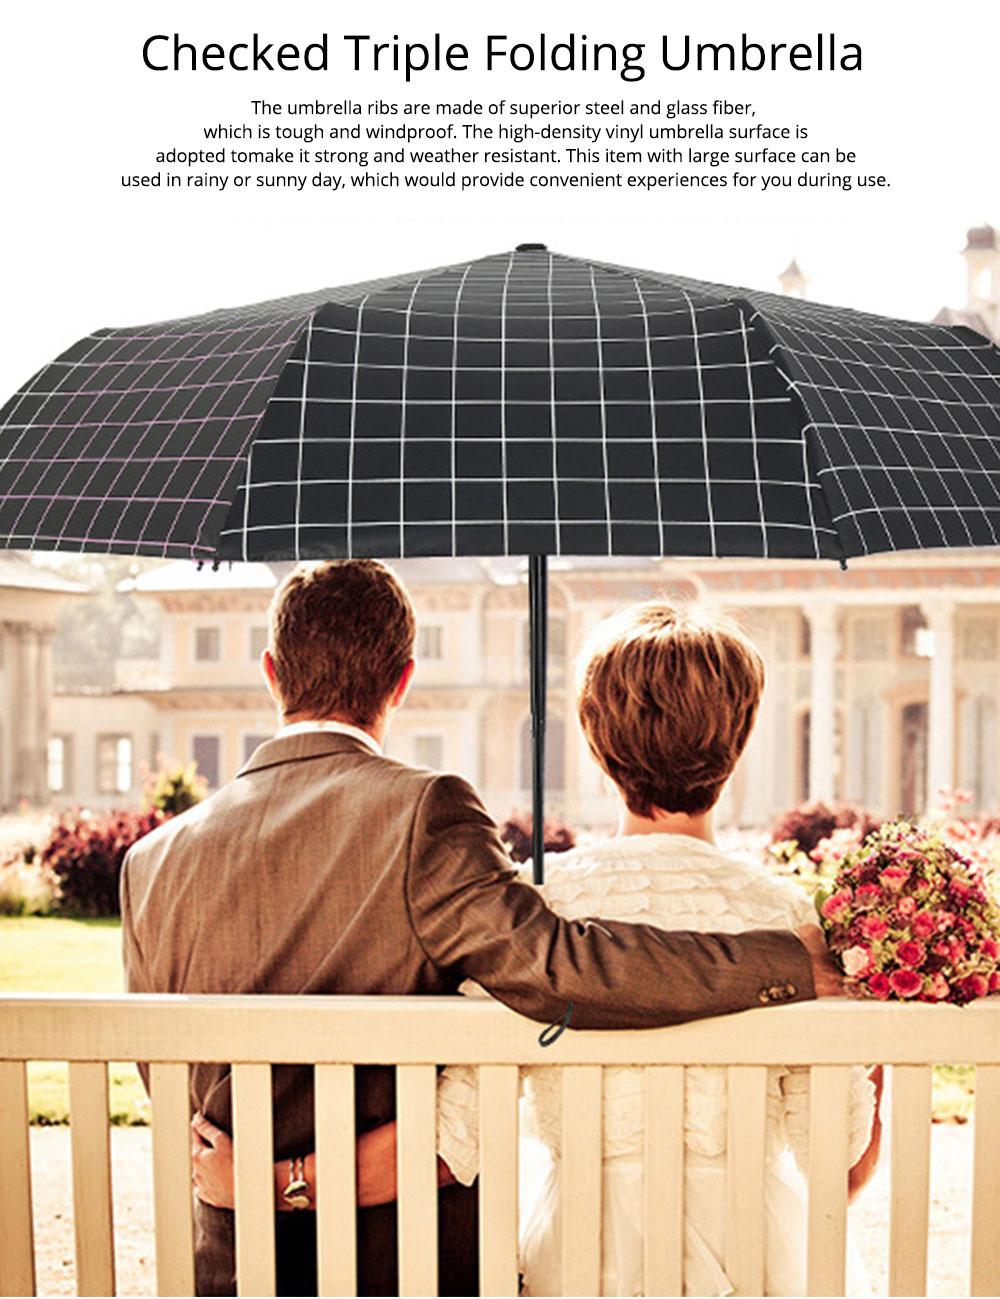 Triple Folding Umbrella in Sunny or Rainy Combination, Sun Protection UV Protection Umbrella with Vinyl Surface 0